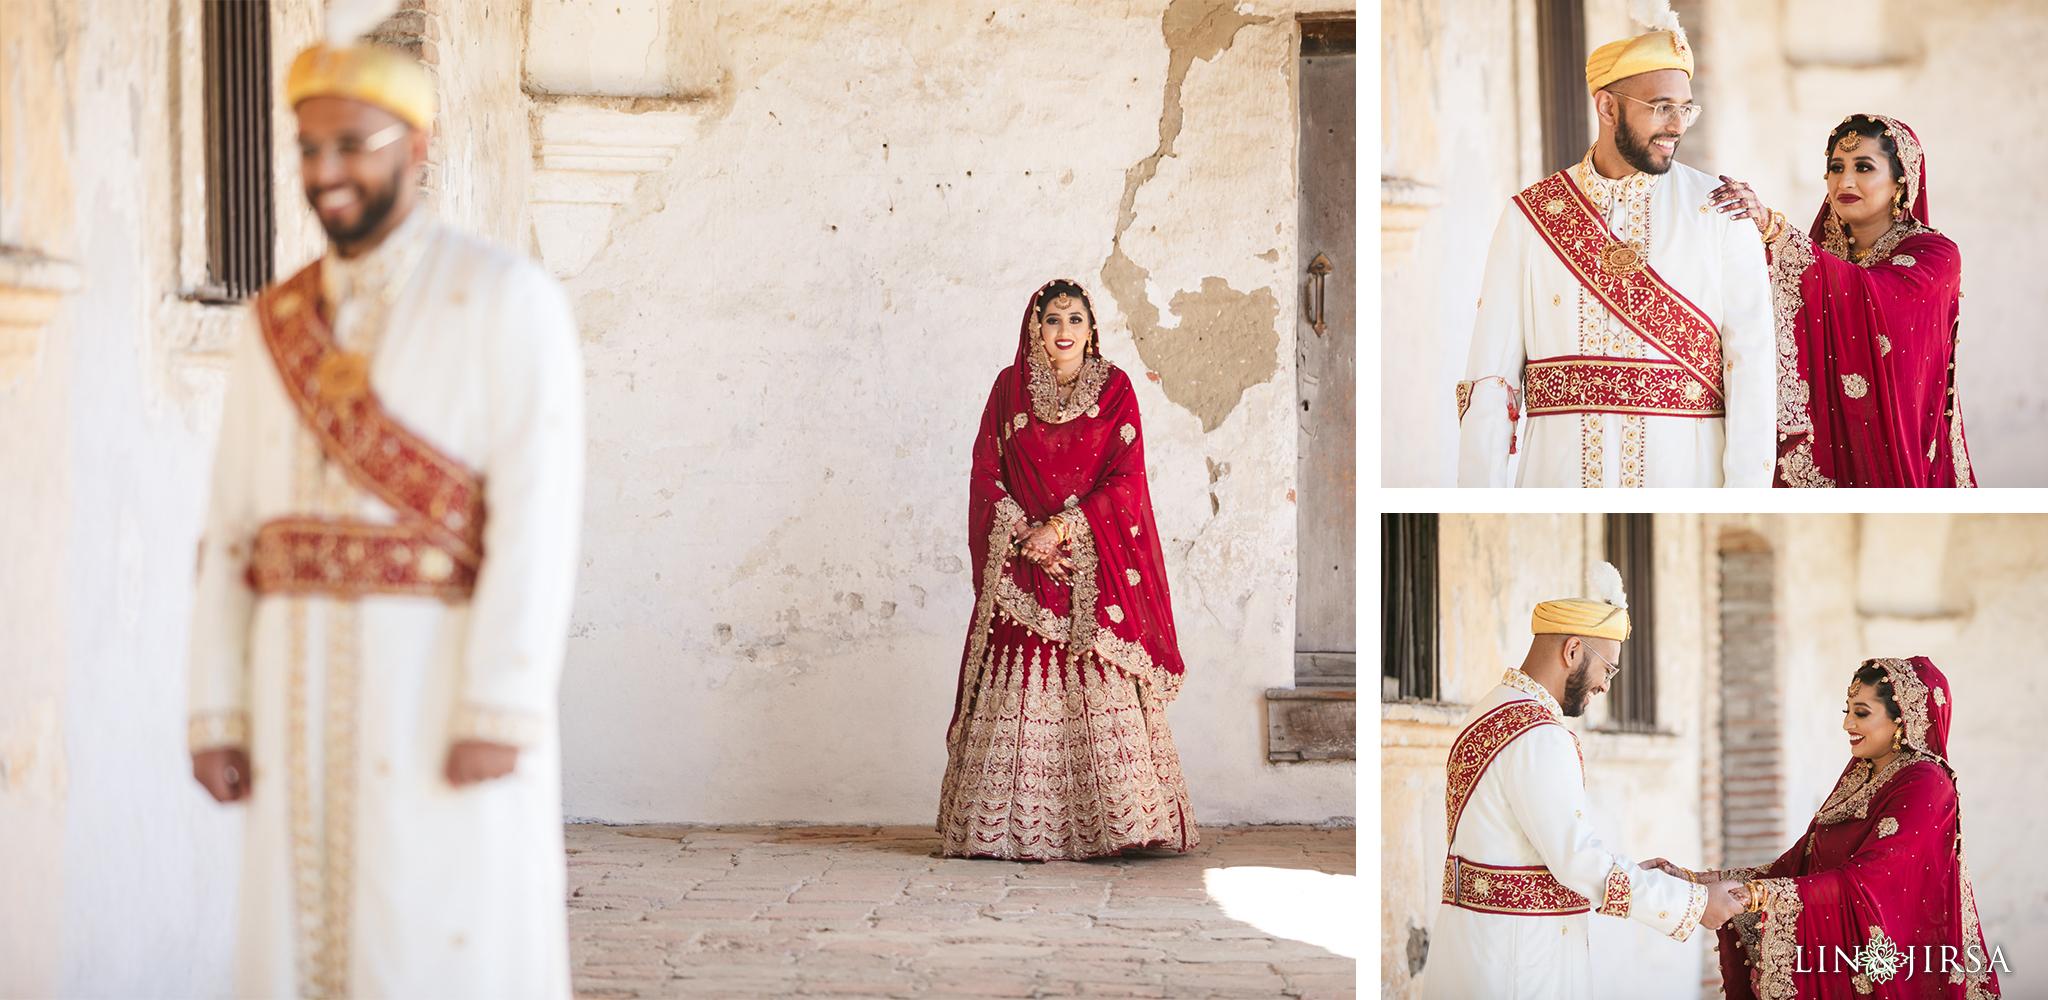 03 Mission San Juan Capistrano Shia Muslim Wedding Photography